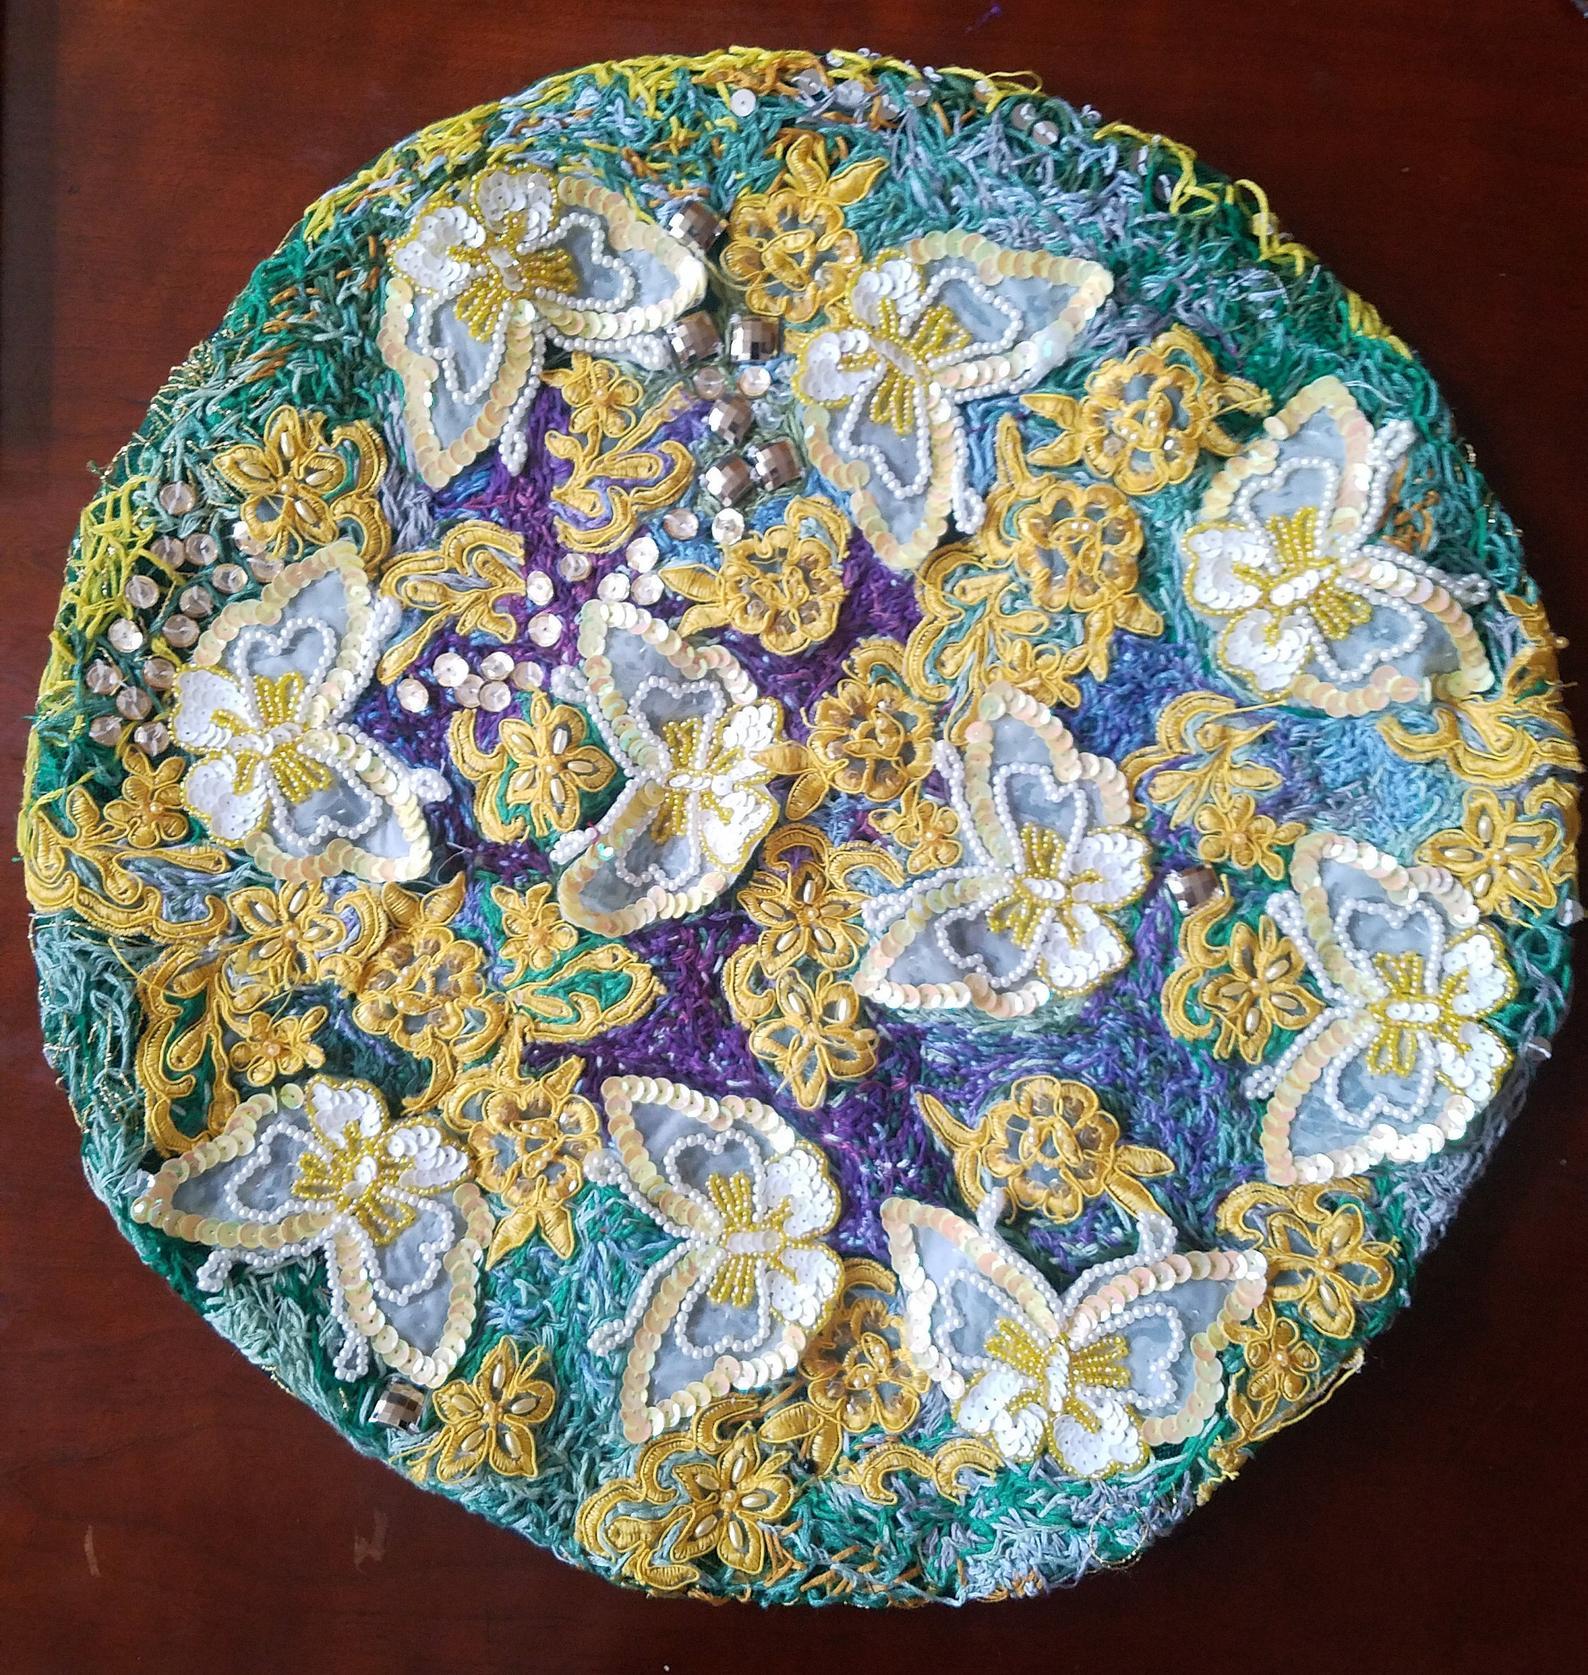 Prairie Lande butterfly embroidery piece